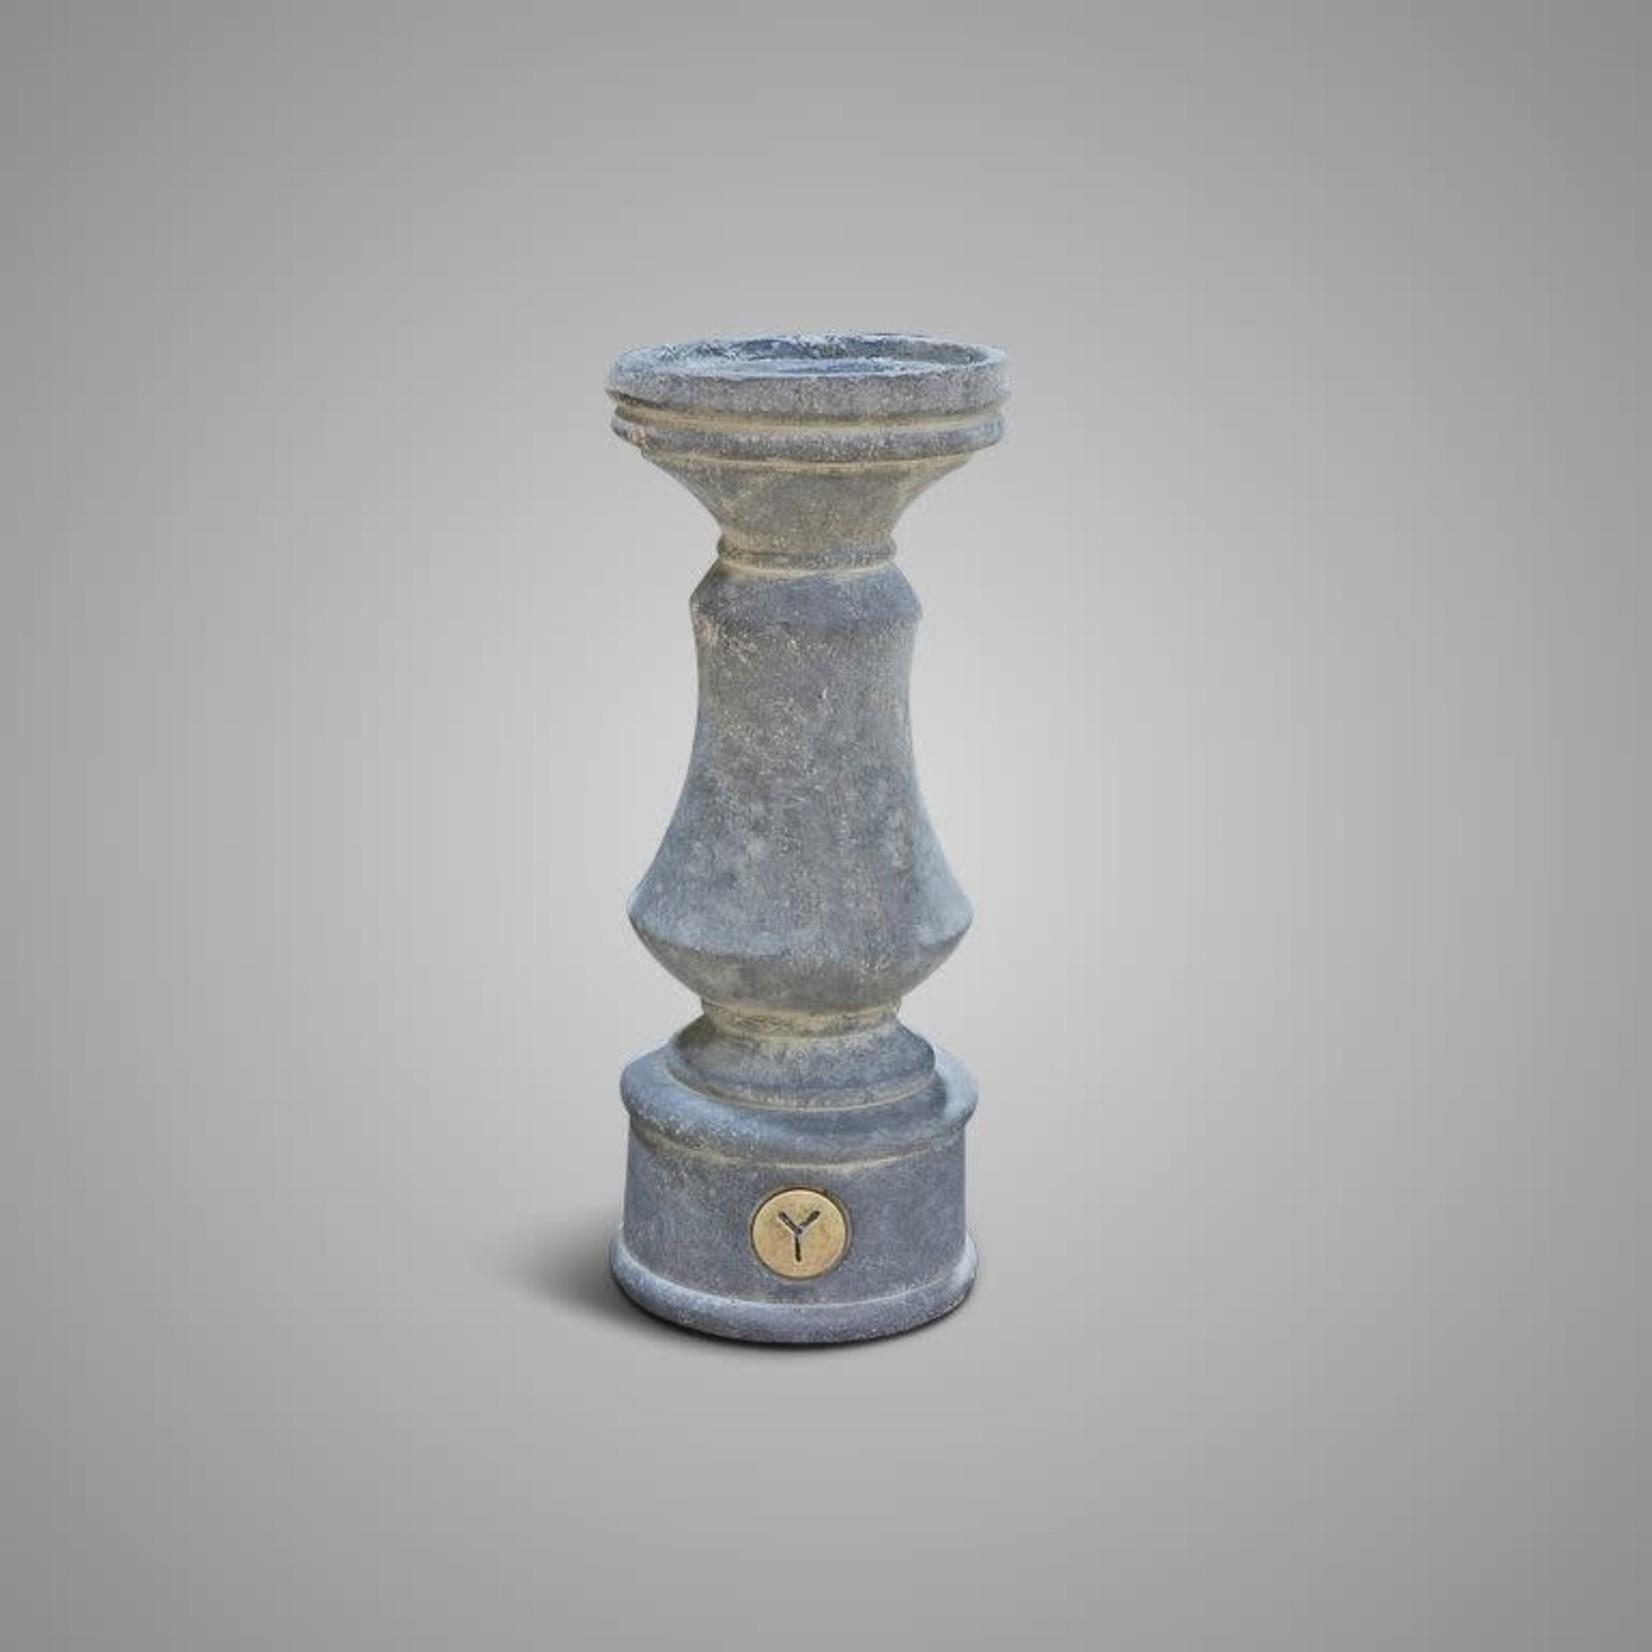 Brynxz Brynxz Candleholder Boost Majestic Vintage